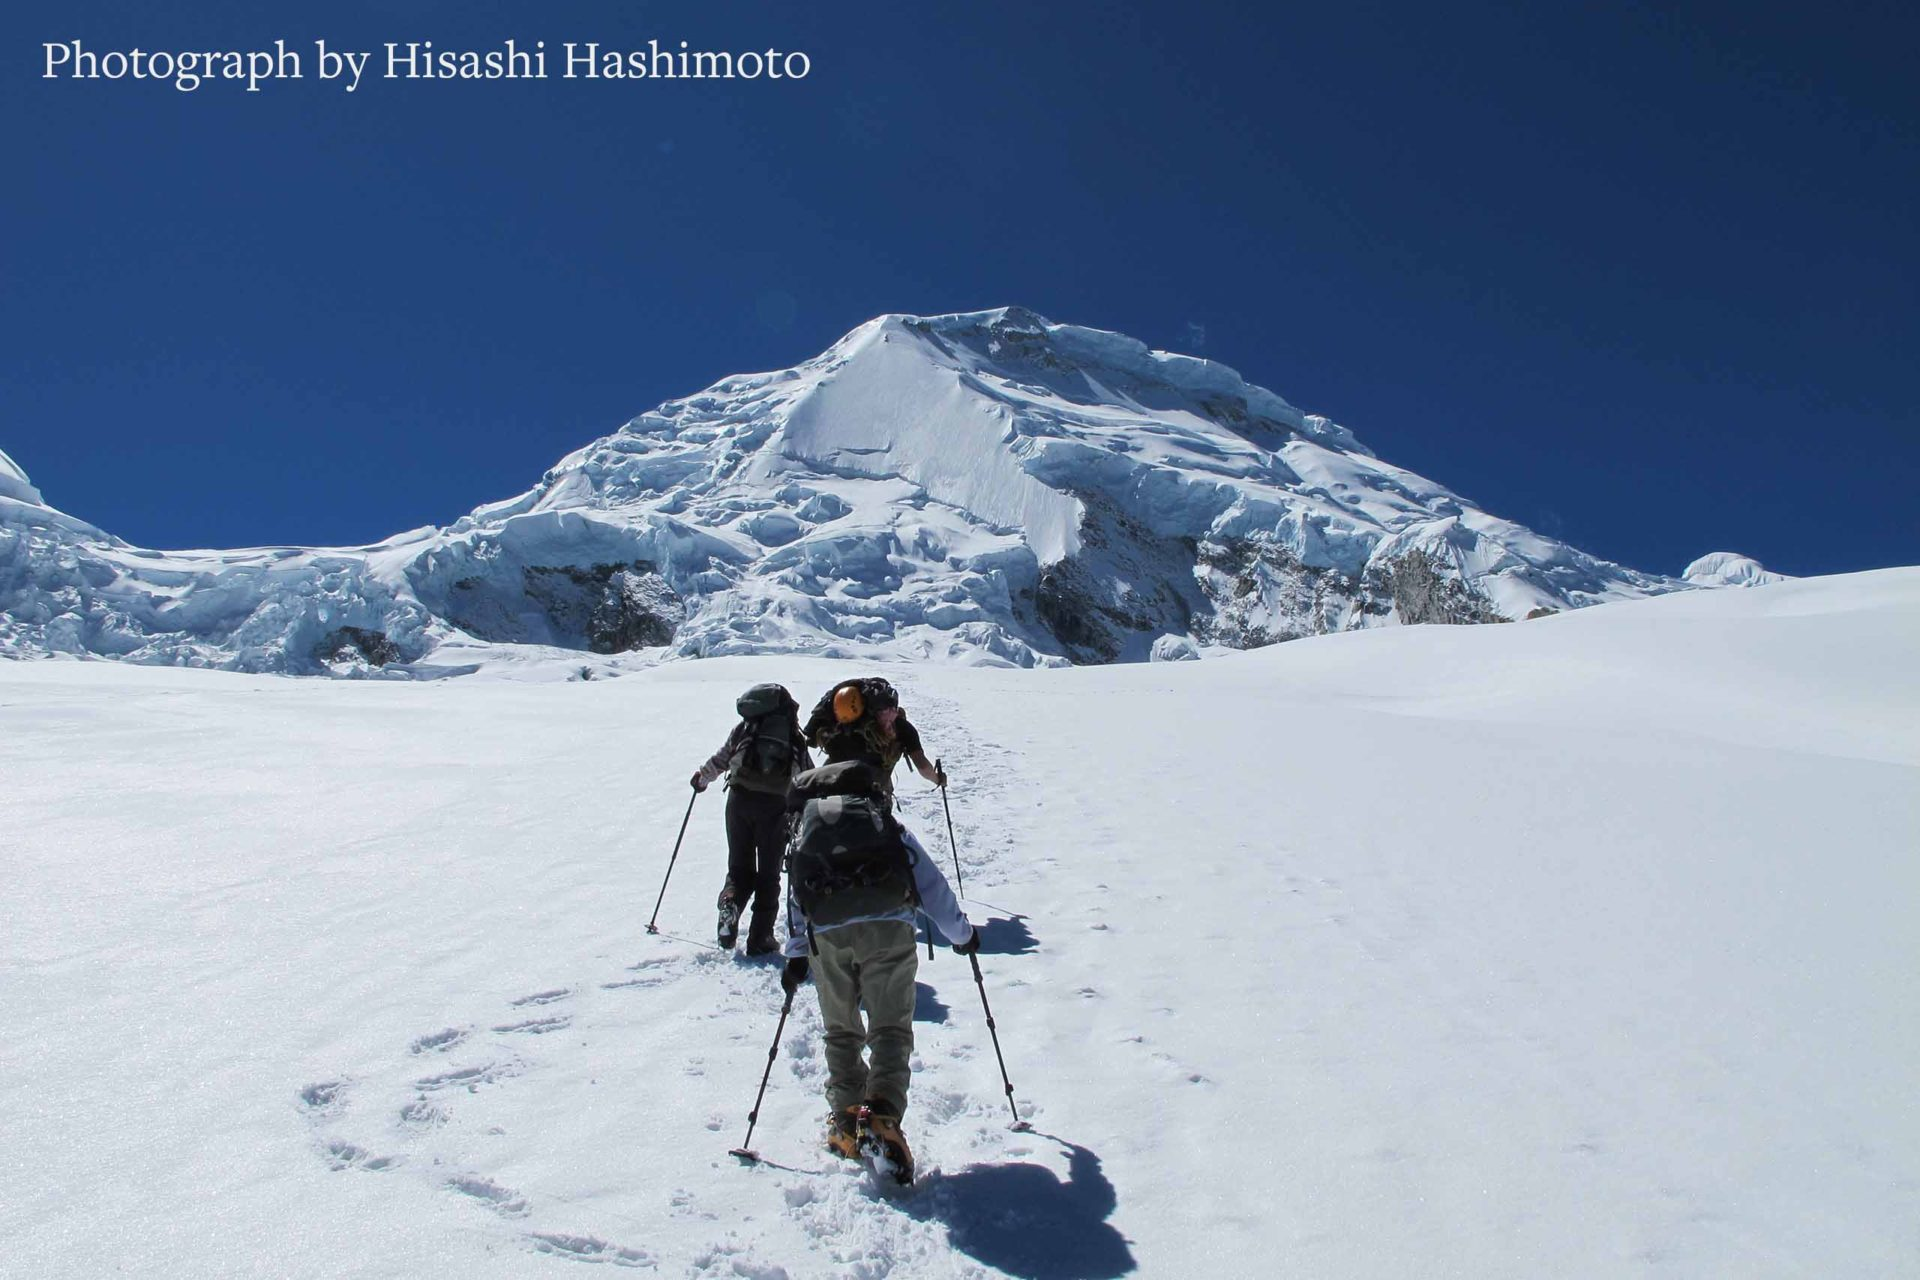 Akira Inoue - nandi peru ワラス 高所登山 ワスカラン ペルー